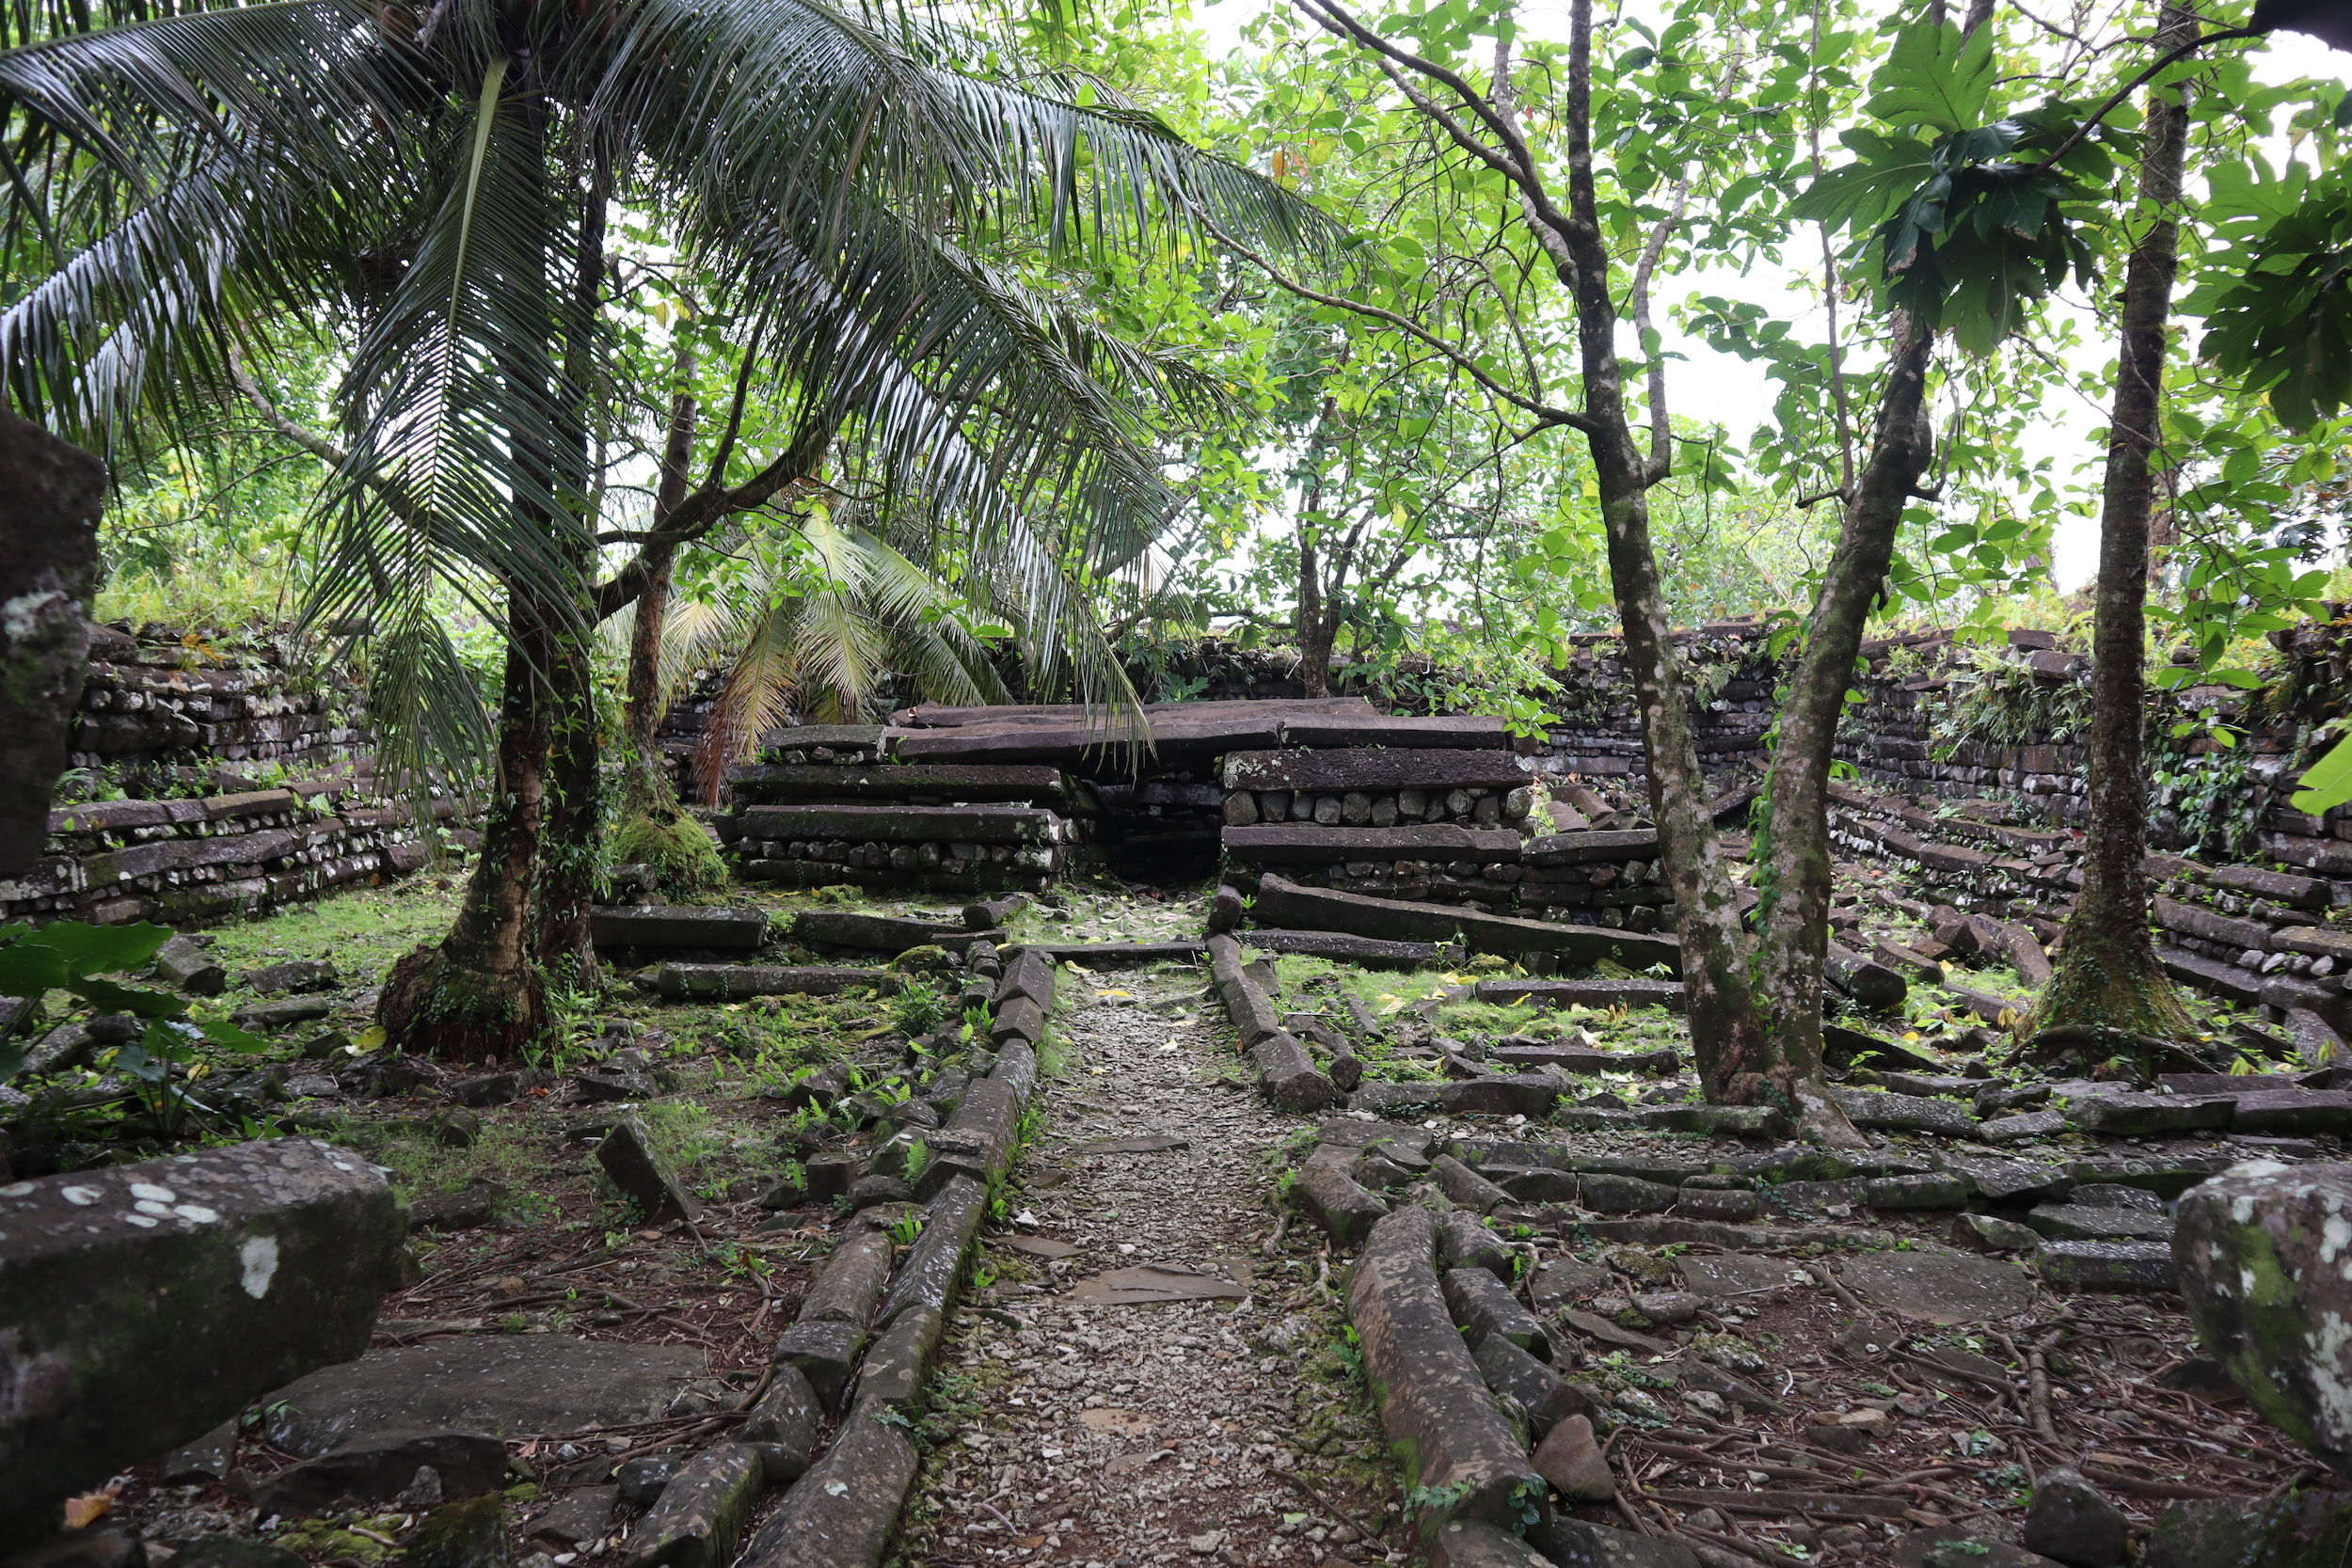 Nan Madol – Central stone altar